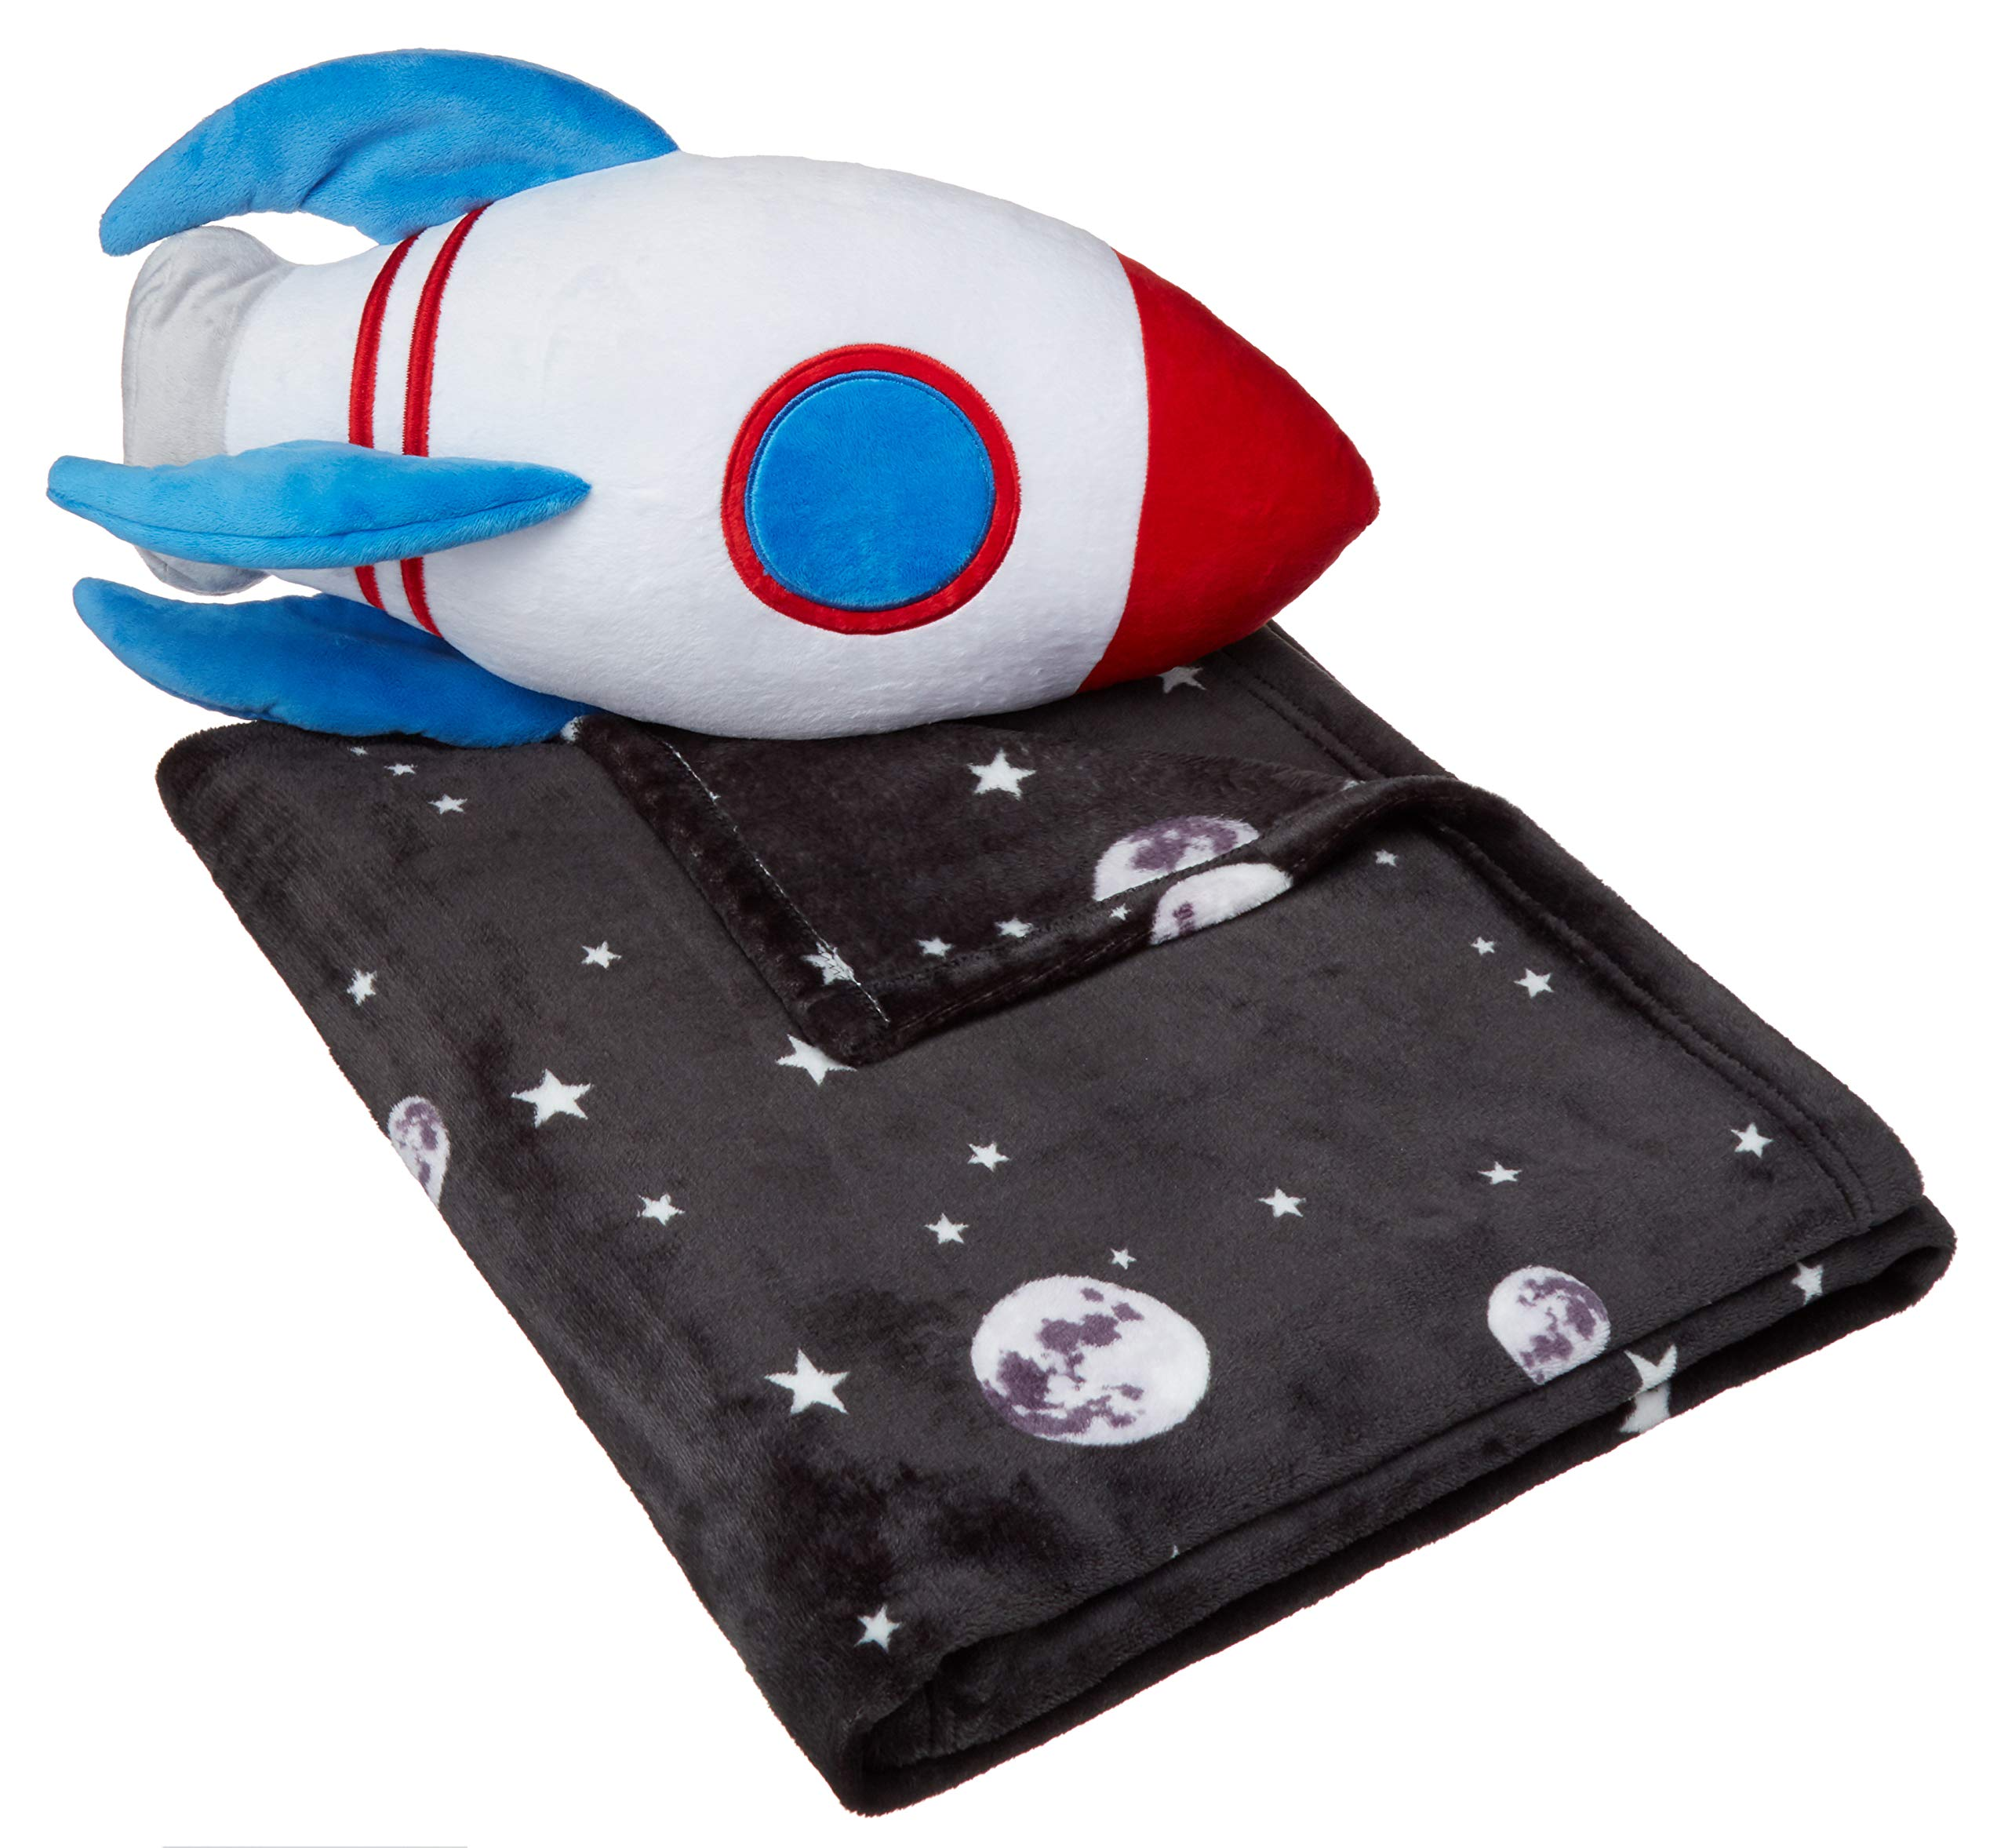 Amazon Basics Kids Space Rocket Bedding Nap Set with Rocket Pillow and Fleece Throw Blanket